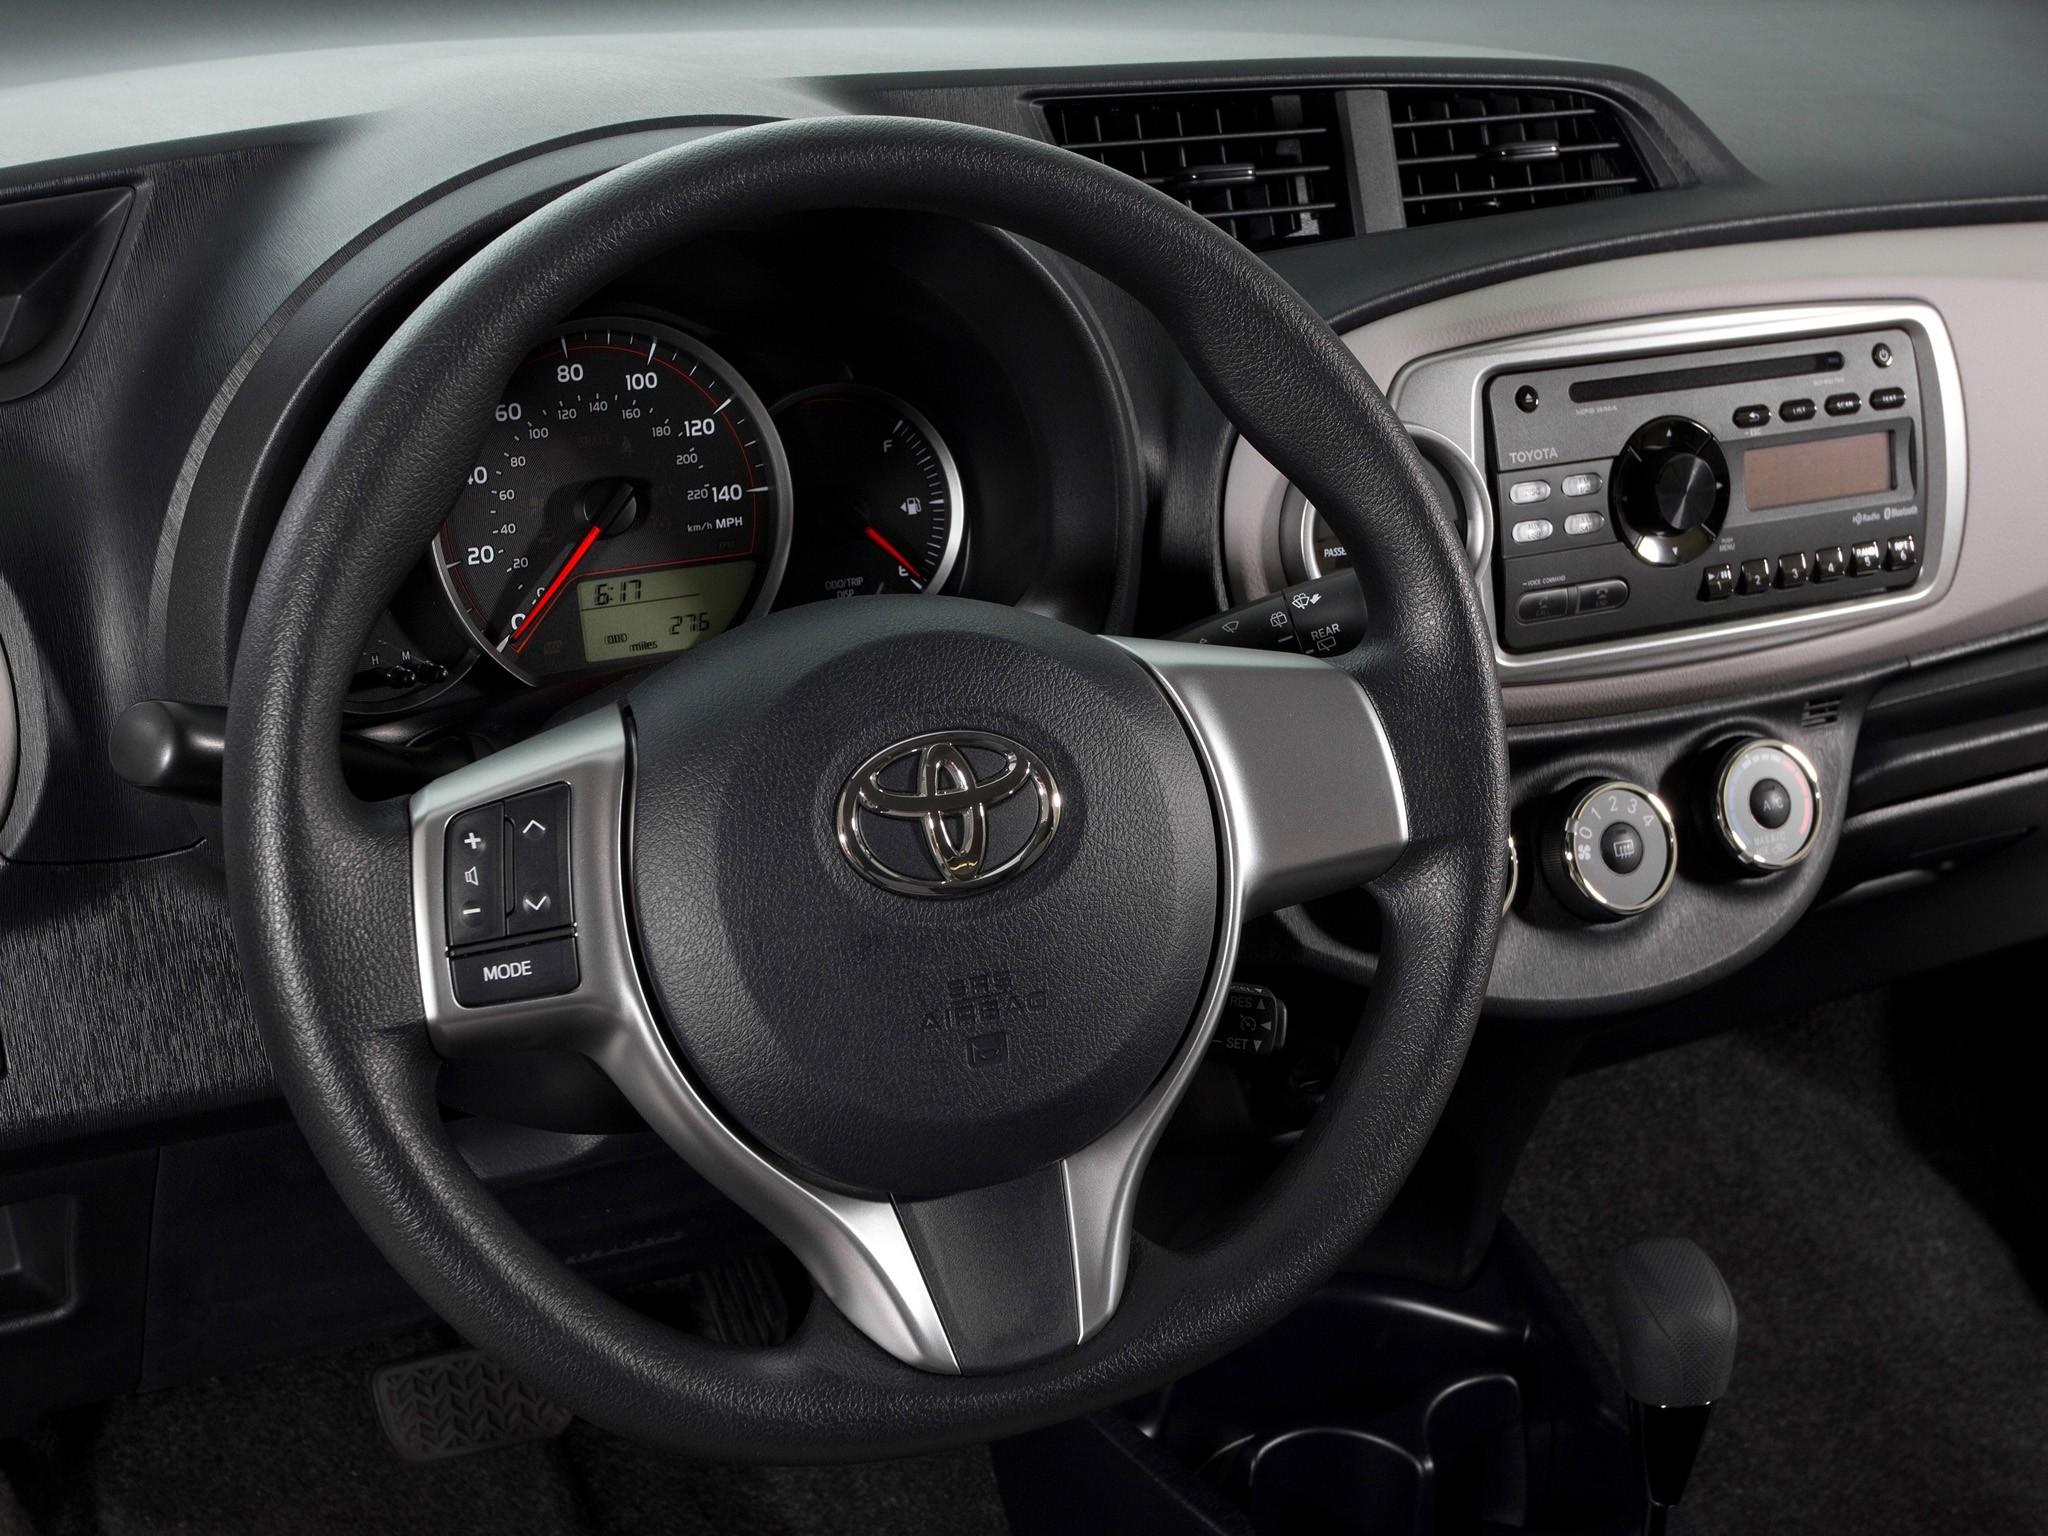 2014 toyota yaris le hatchback sedan 4d